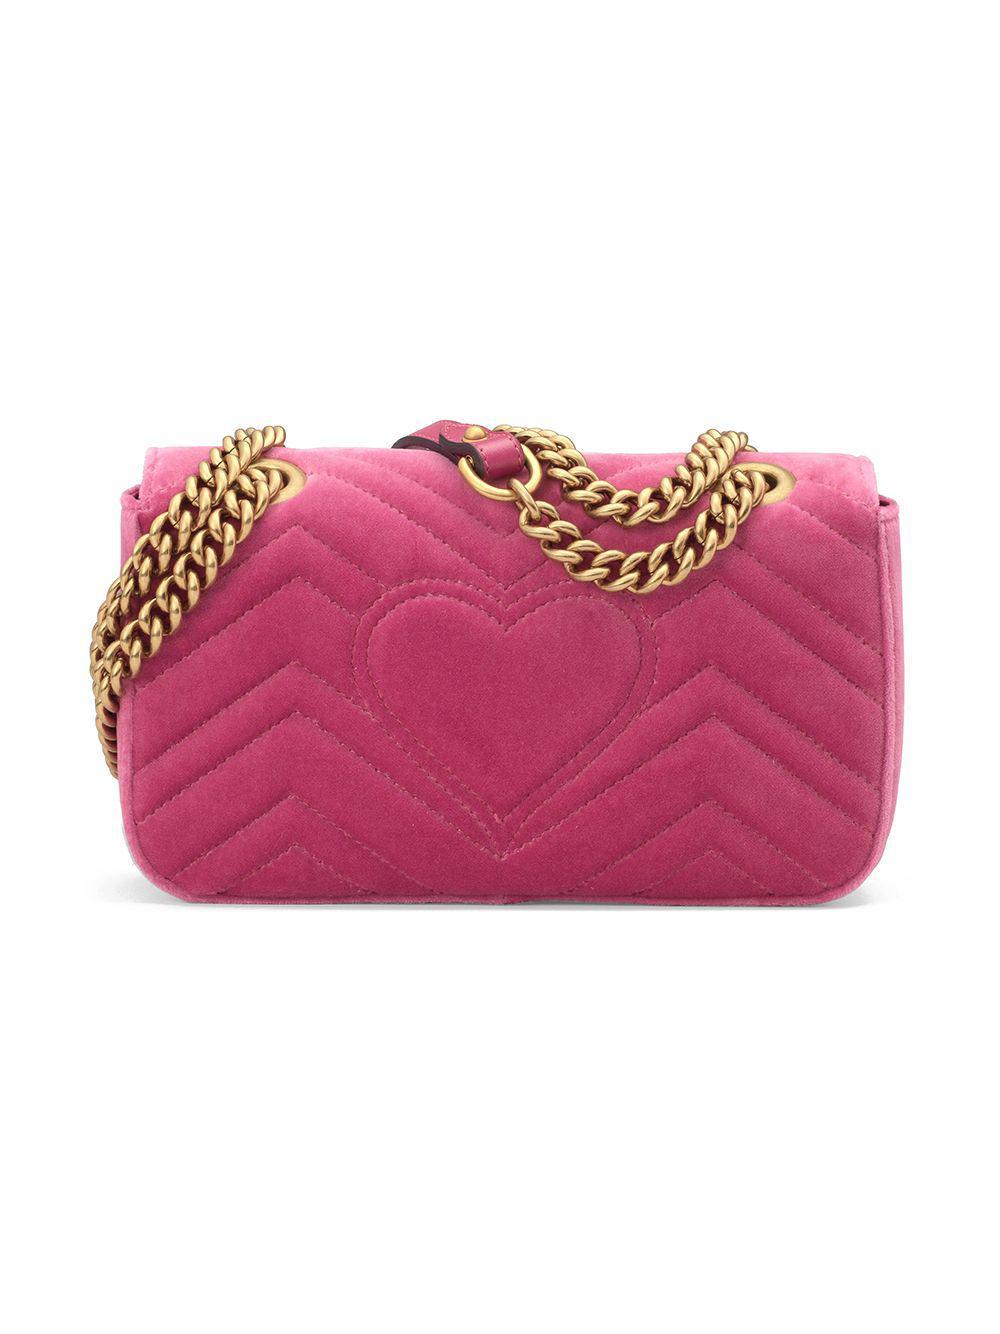 13d73b2097b3 Lyst - Gucci GG Marmont Velvet Mini Bag in Pink